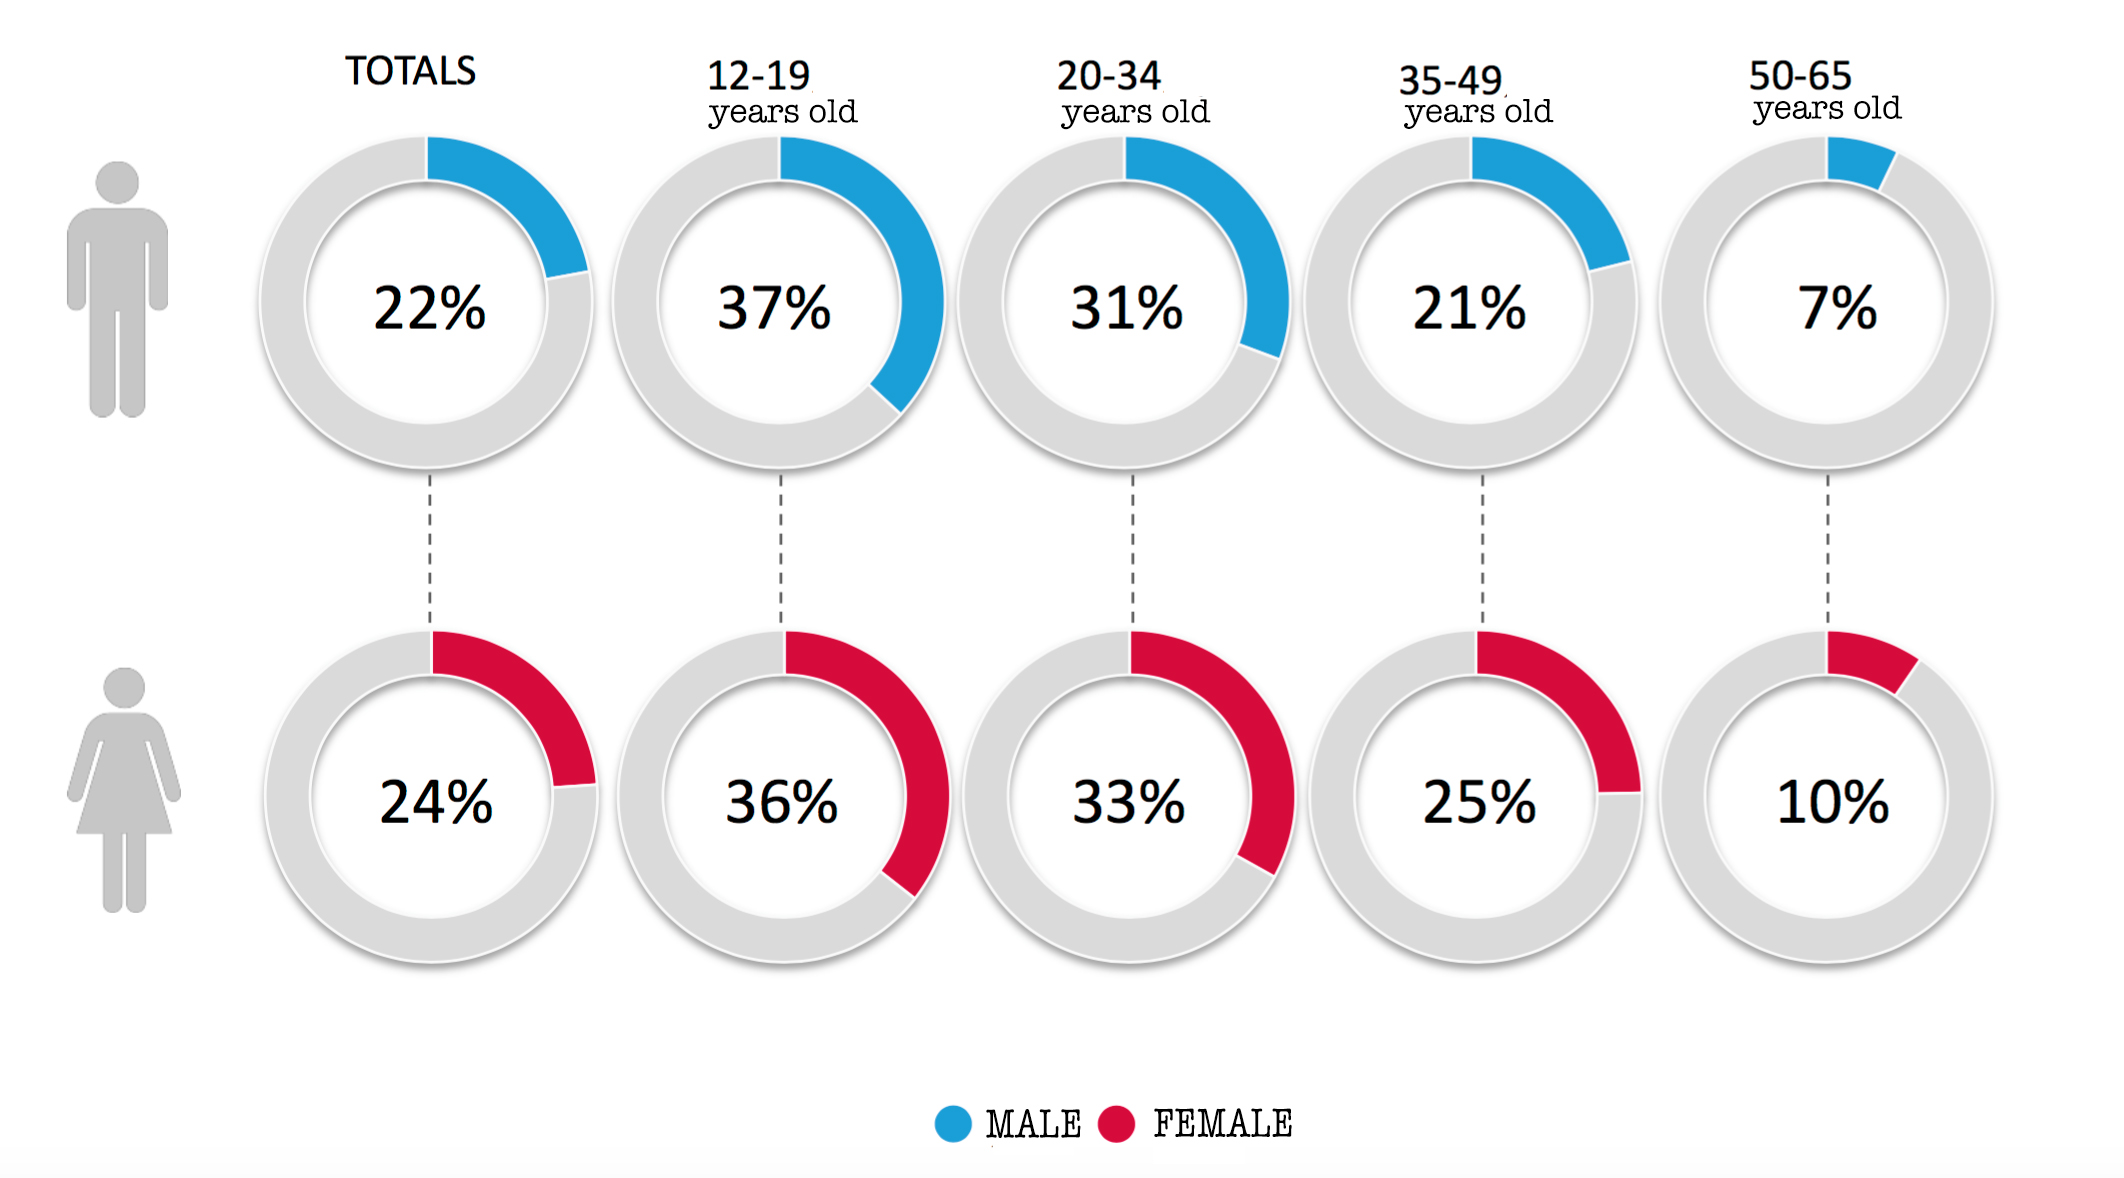 %e8%9e%a2%e5%b9%95%e5%bf%ab%e7%85%a7-2016-09-21-%e4%b8%8b%e5%8d%883-46-29